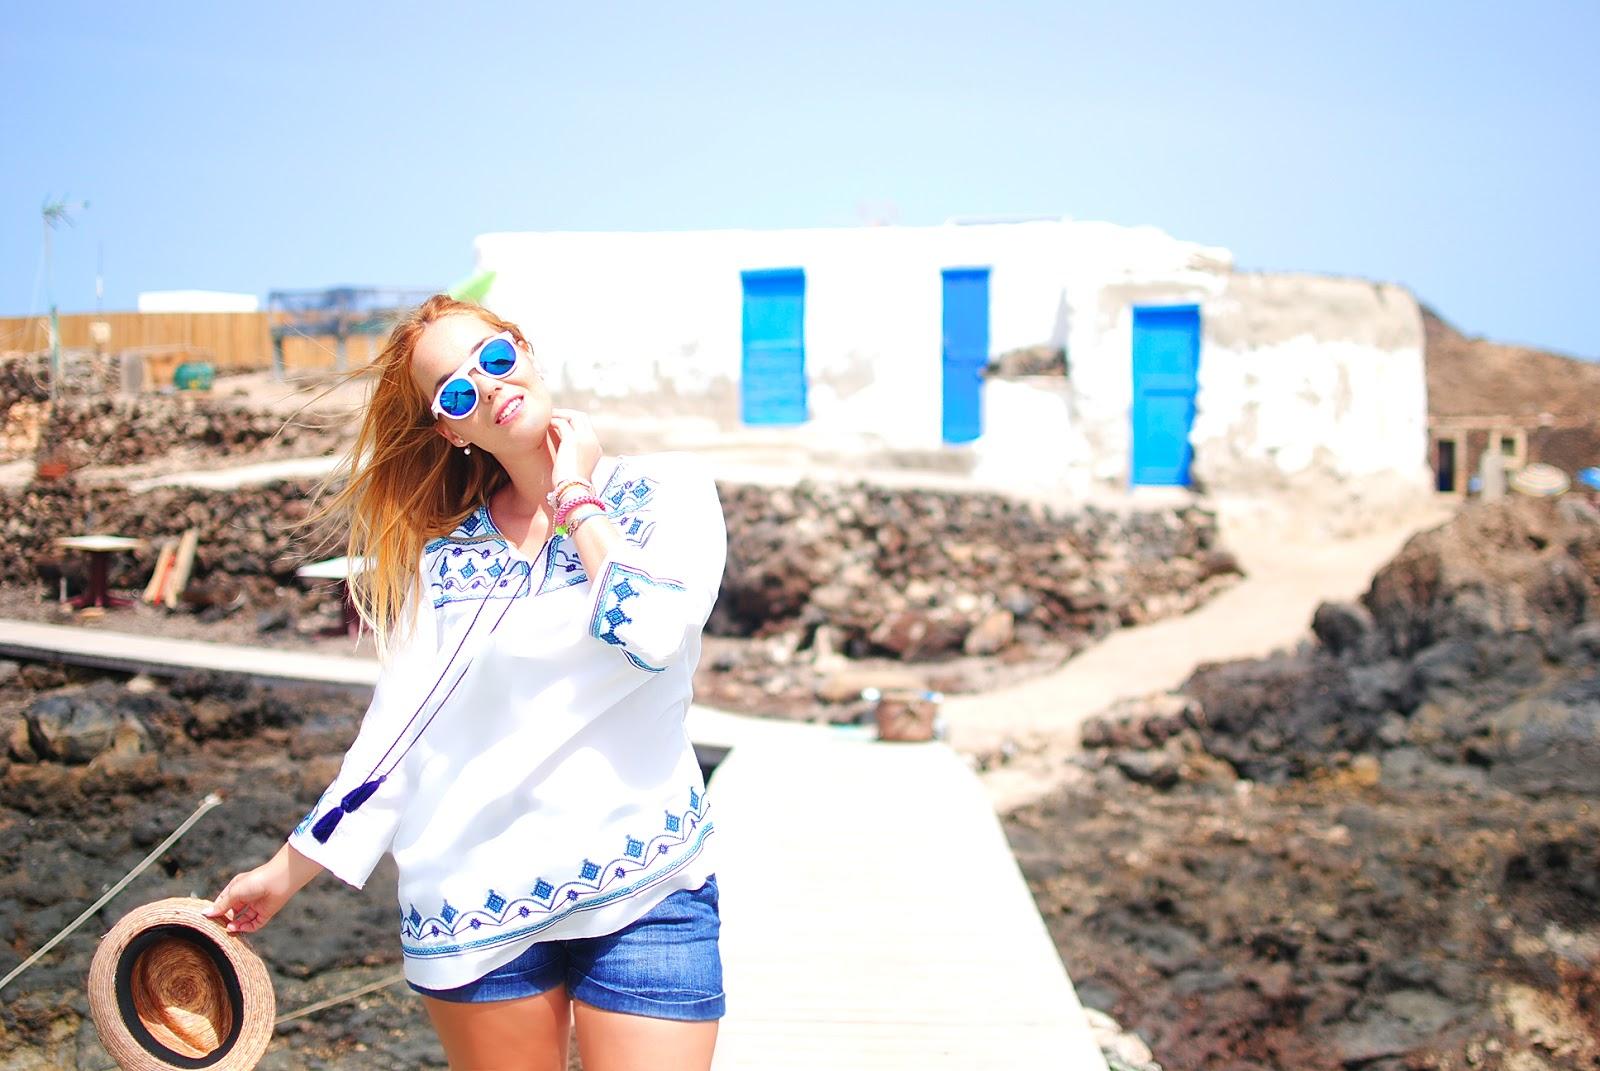 isla de lobos, nery hdez, chicwish, reflective sunglasses, snb, blonde, fuerteventura, pendientes mise, clon mise dior,